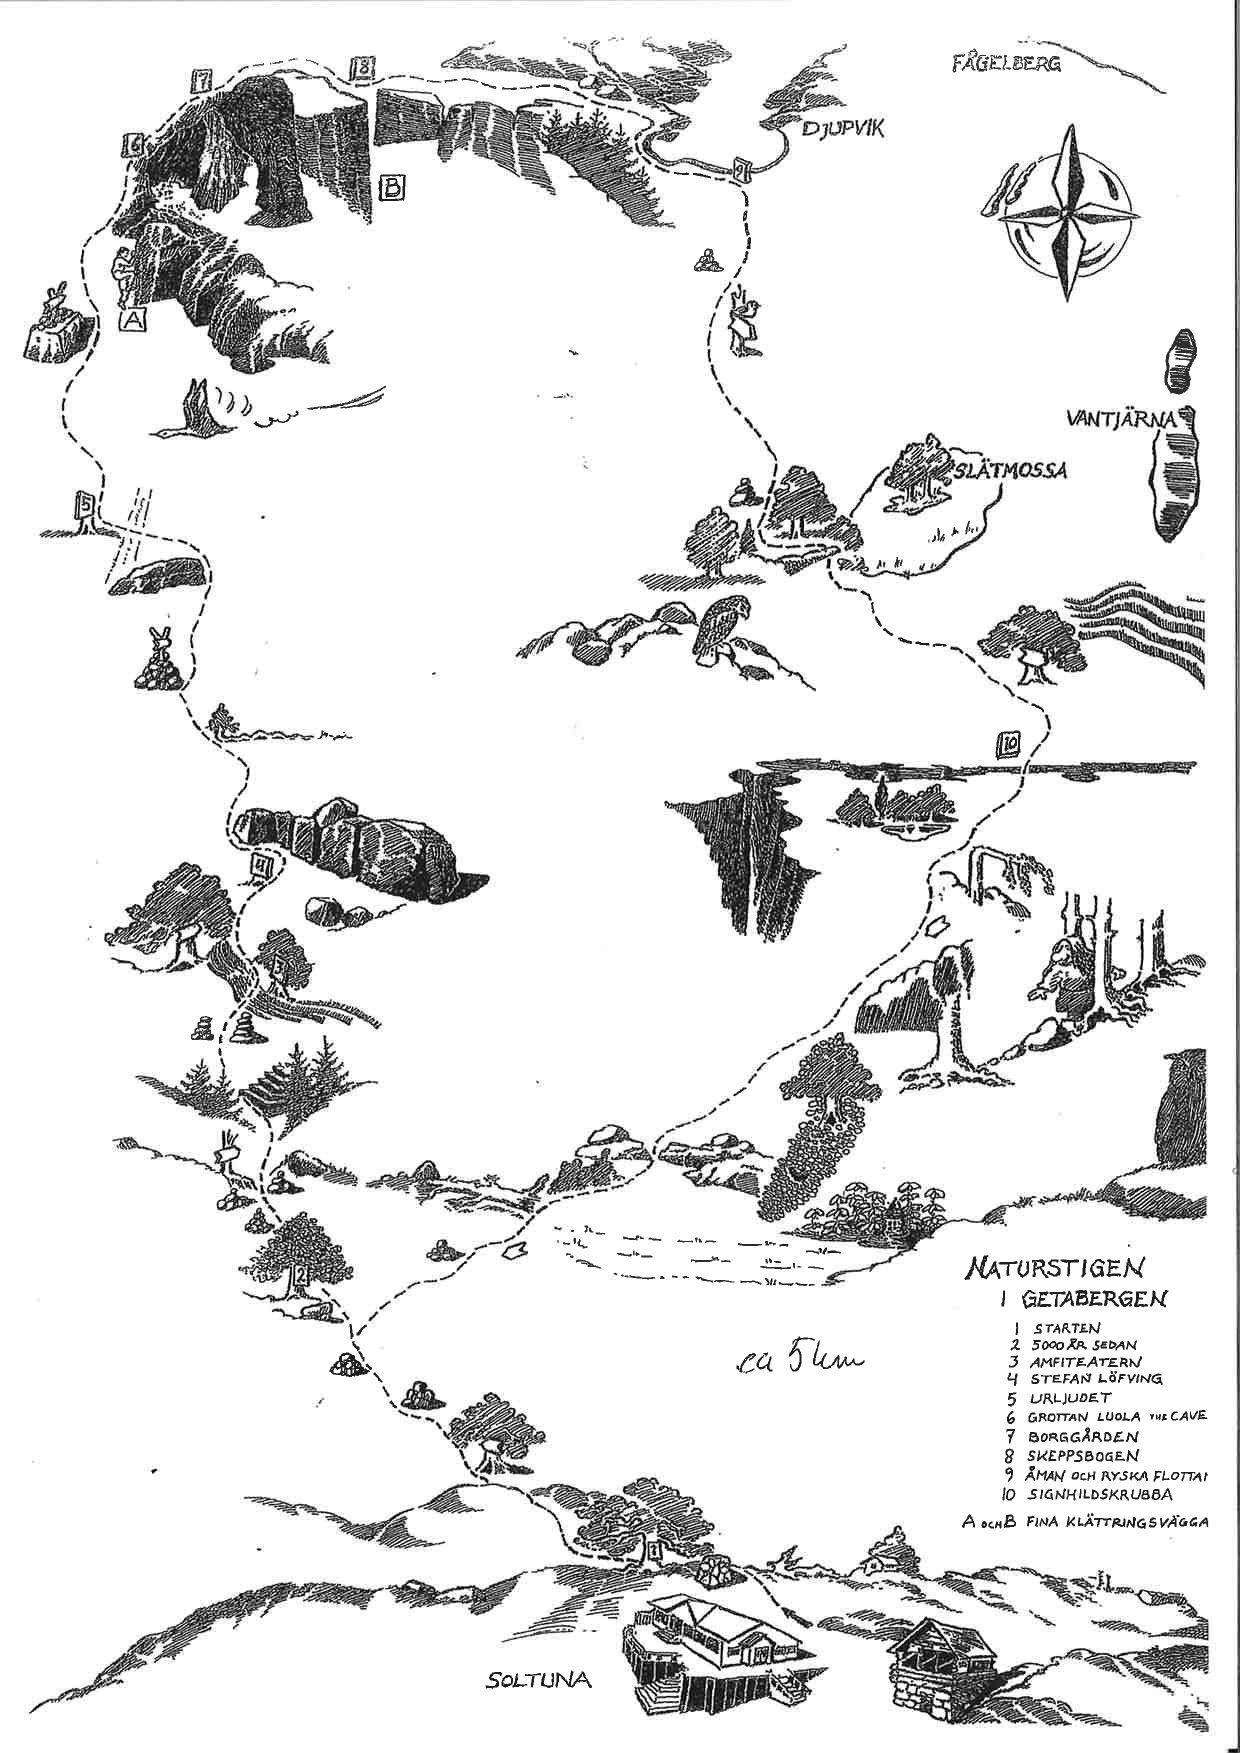 Grottstigen - Naturstigen i Getabergen